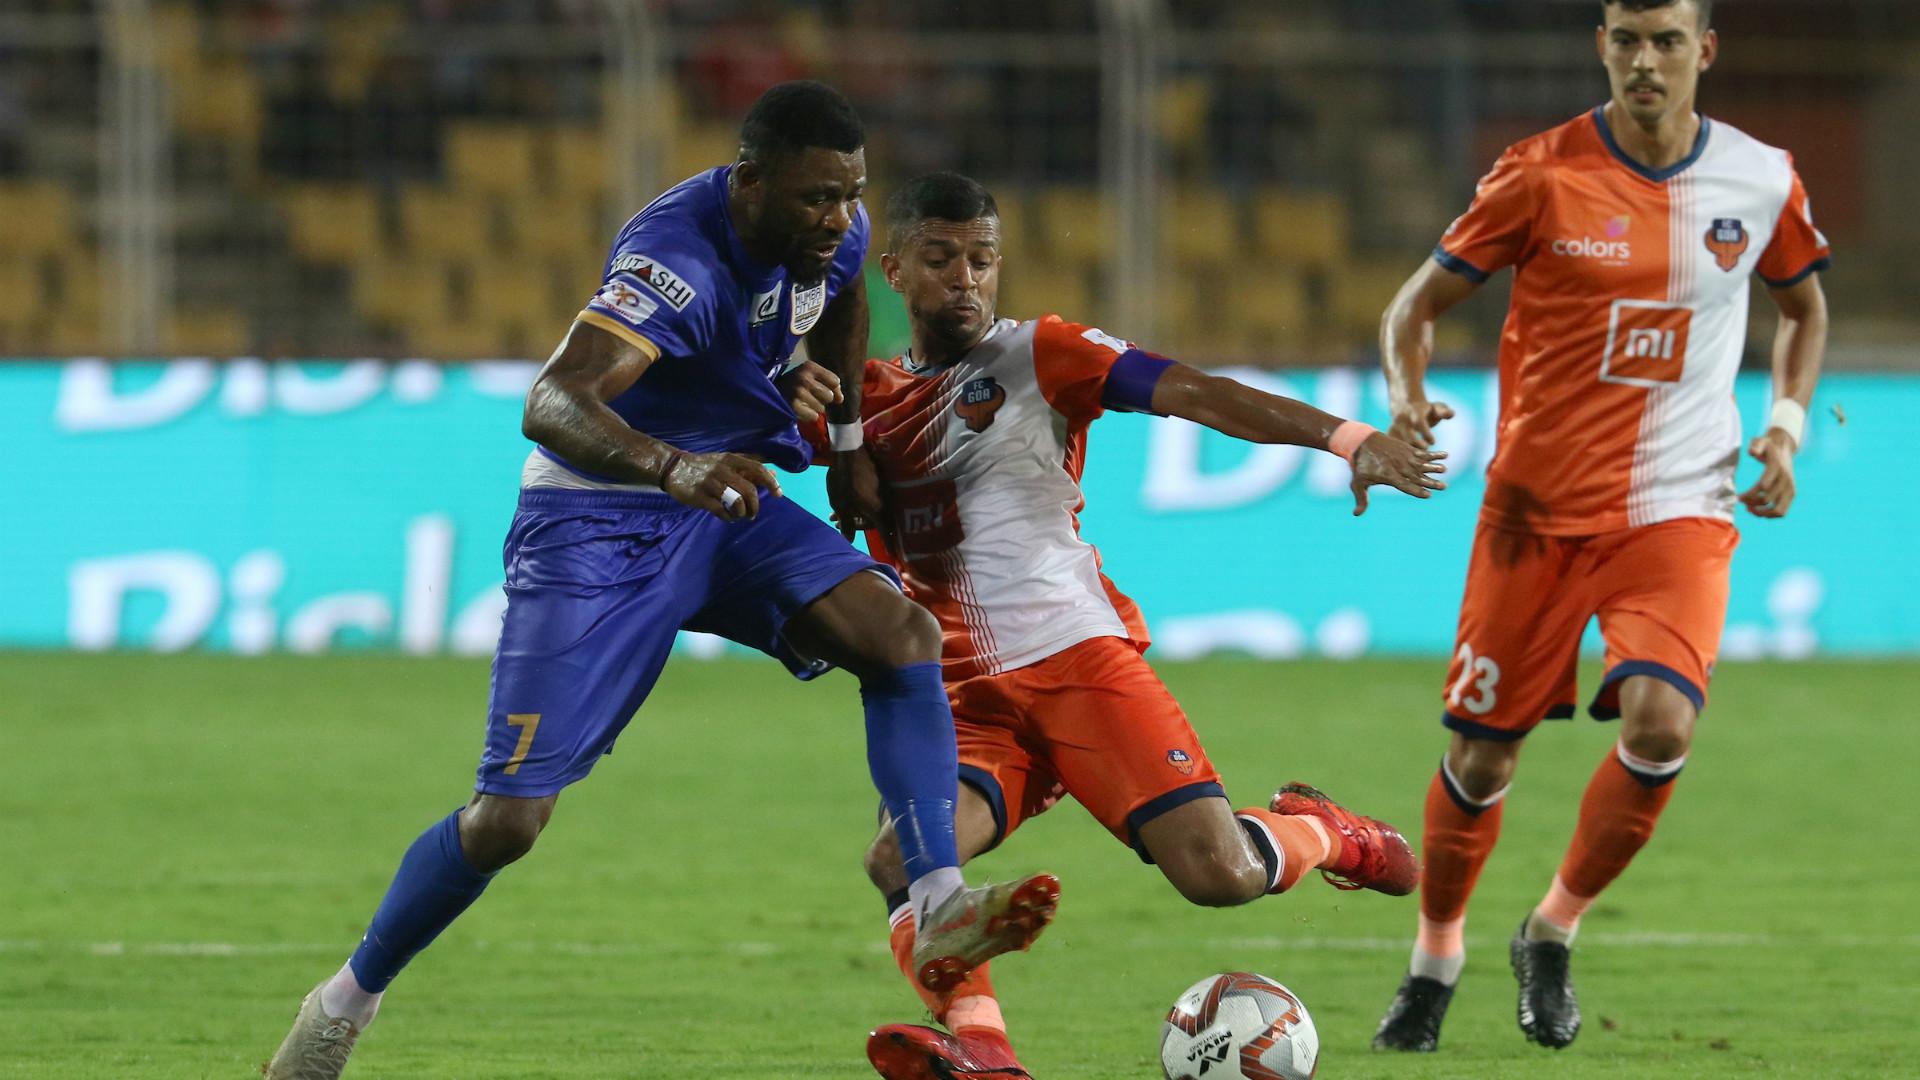 Arnold Issoko Mandar Rao Dessai FC Goa Mumbai City FC ISL 5 03122019